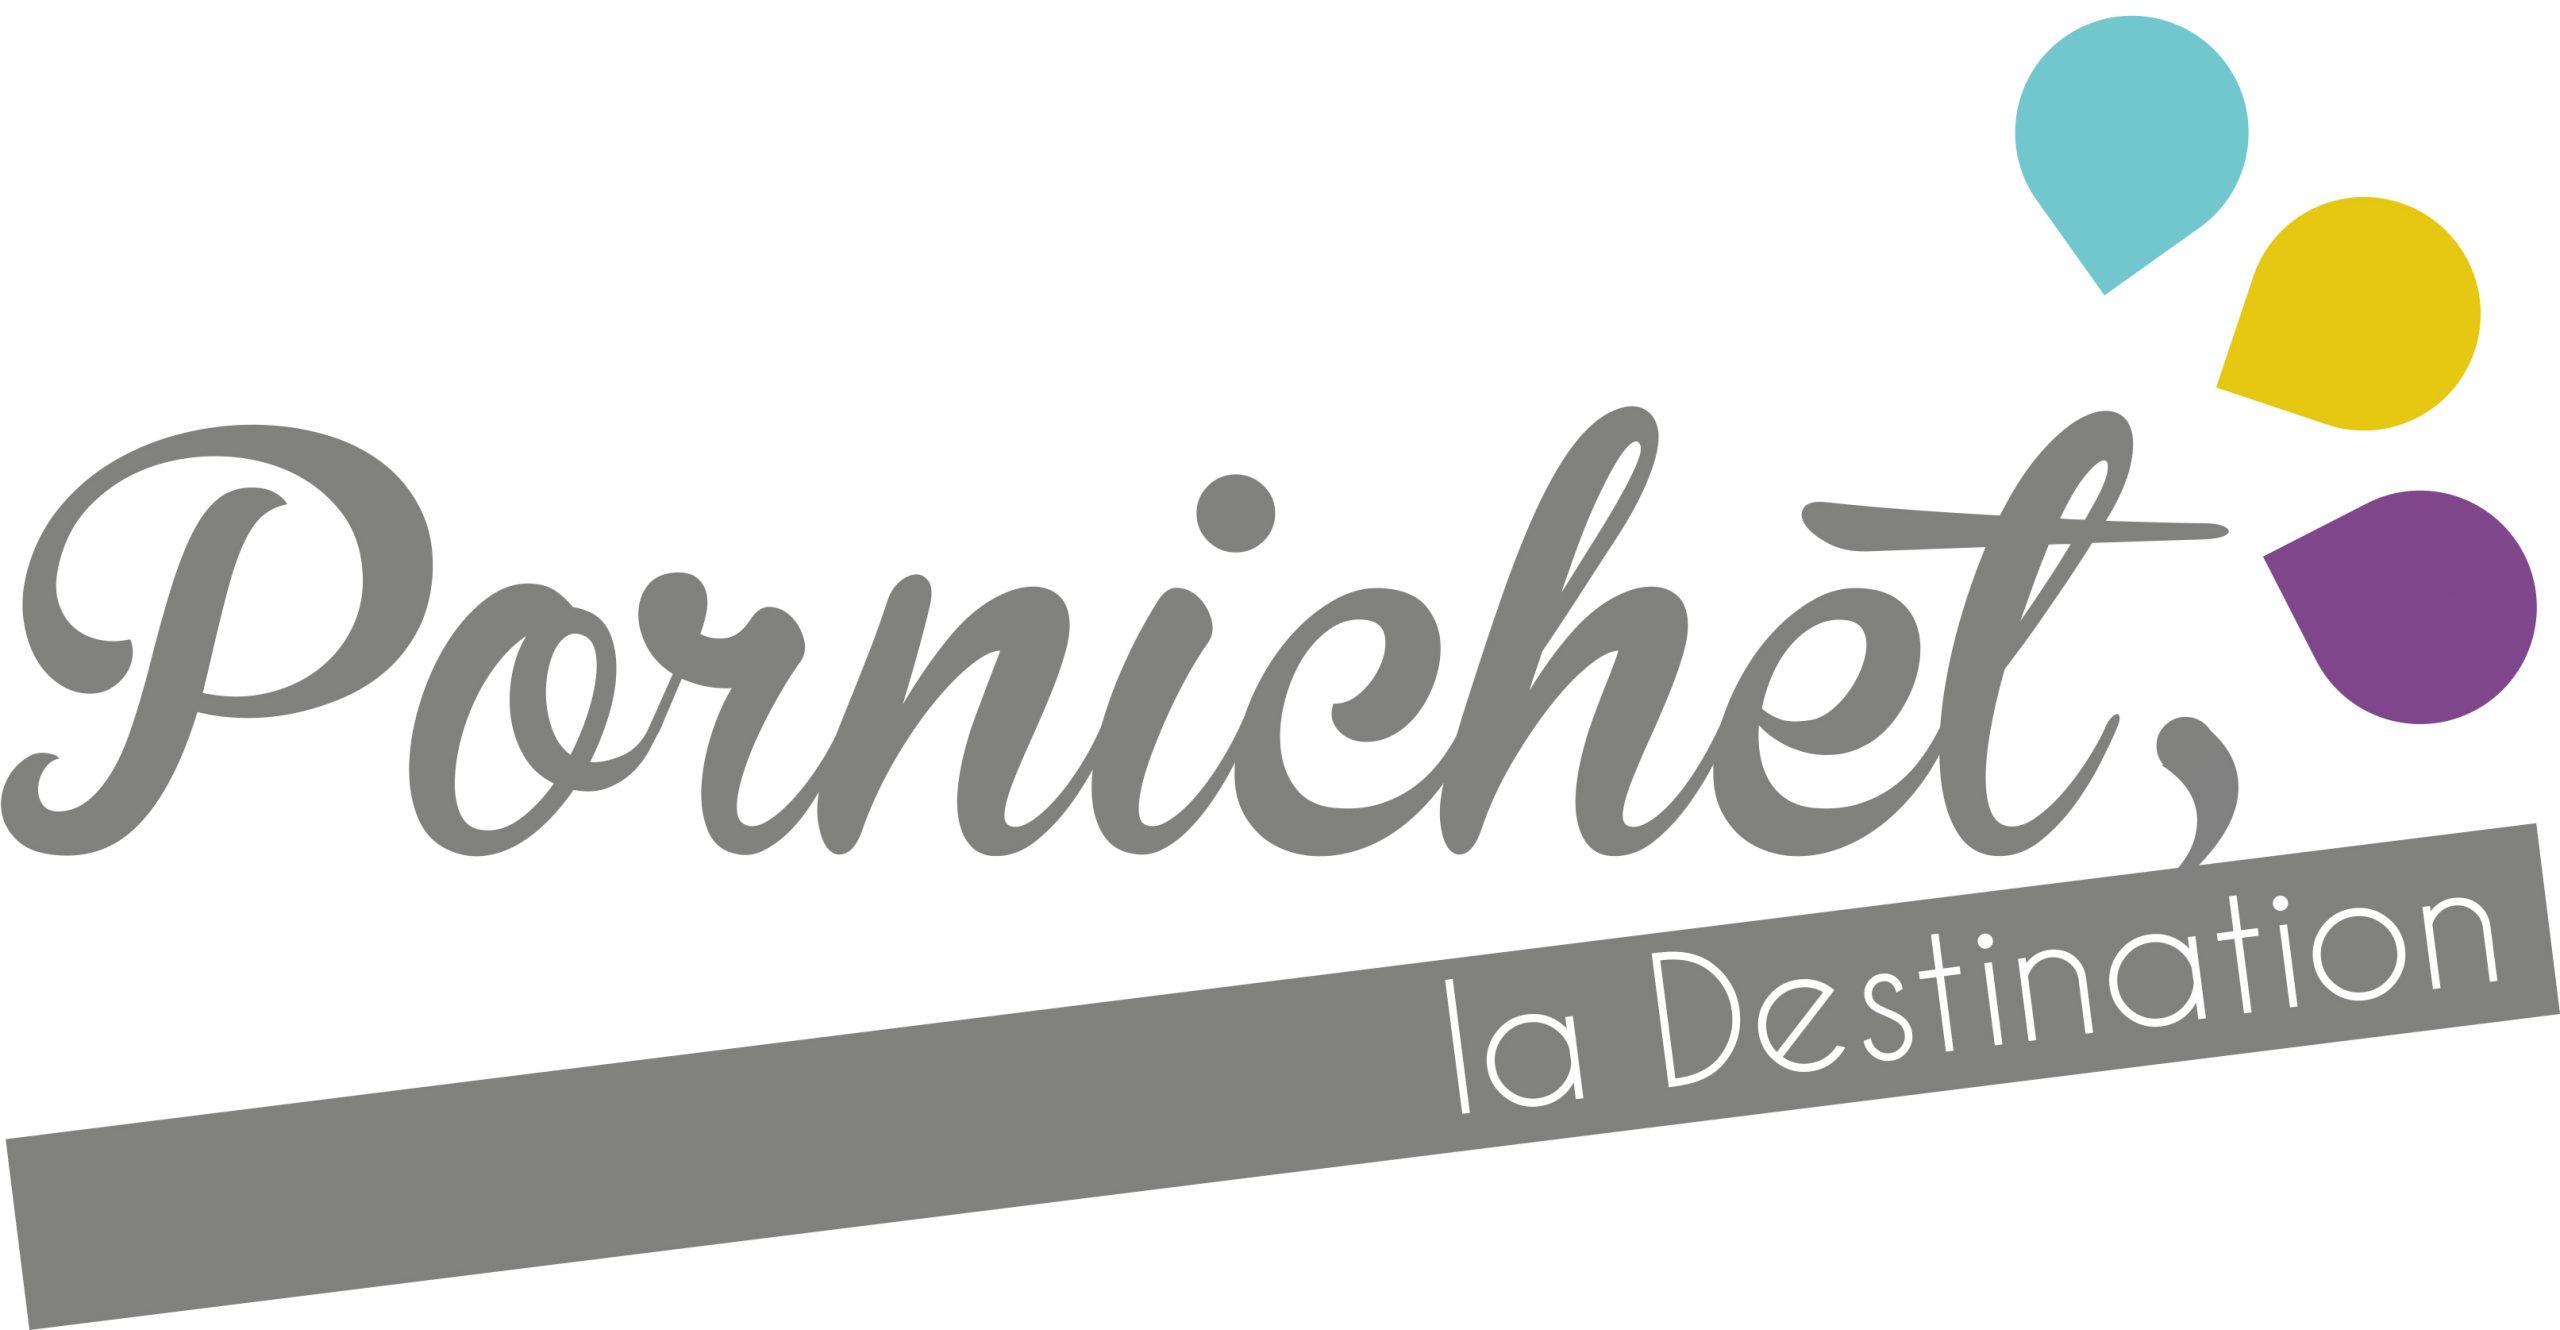 LOGO_Pornichet-la-destination